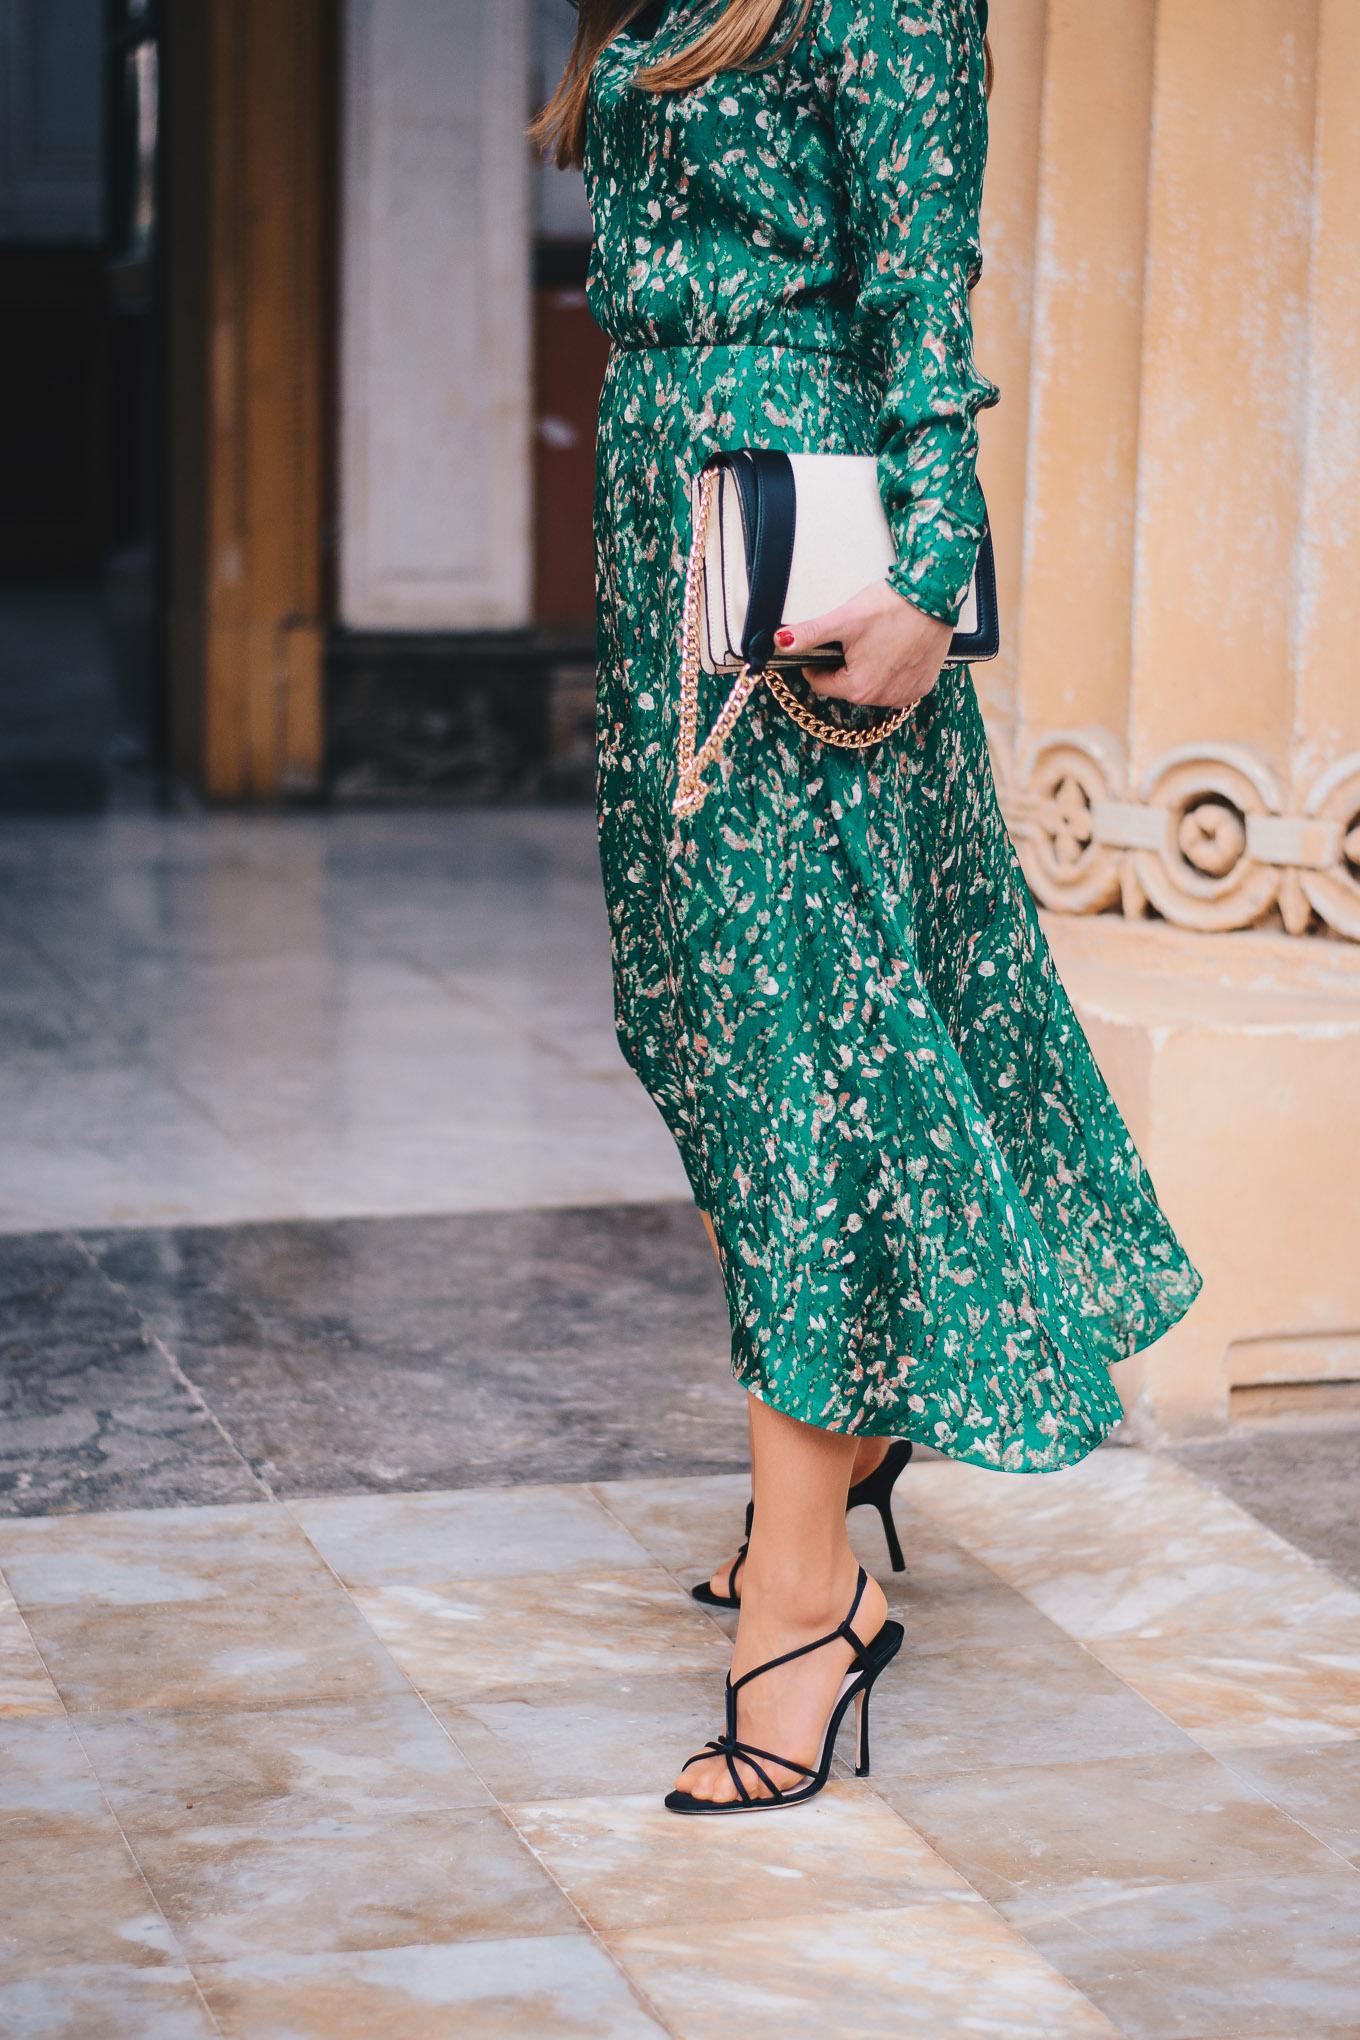 HM Conscious Exclusive organic silk dress